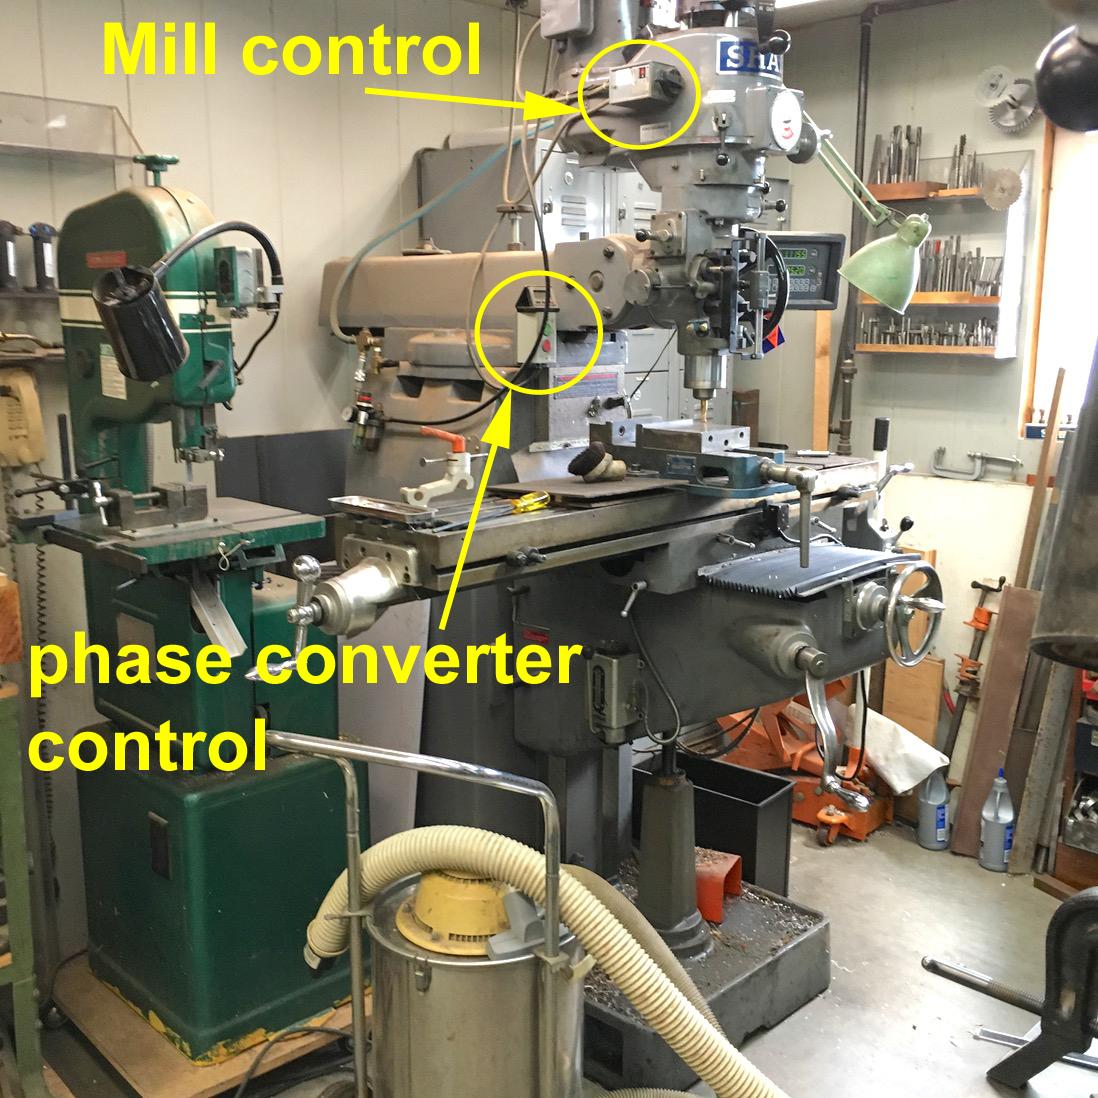 1 mill control.jpg